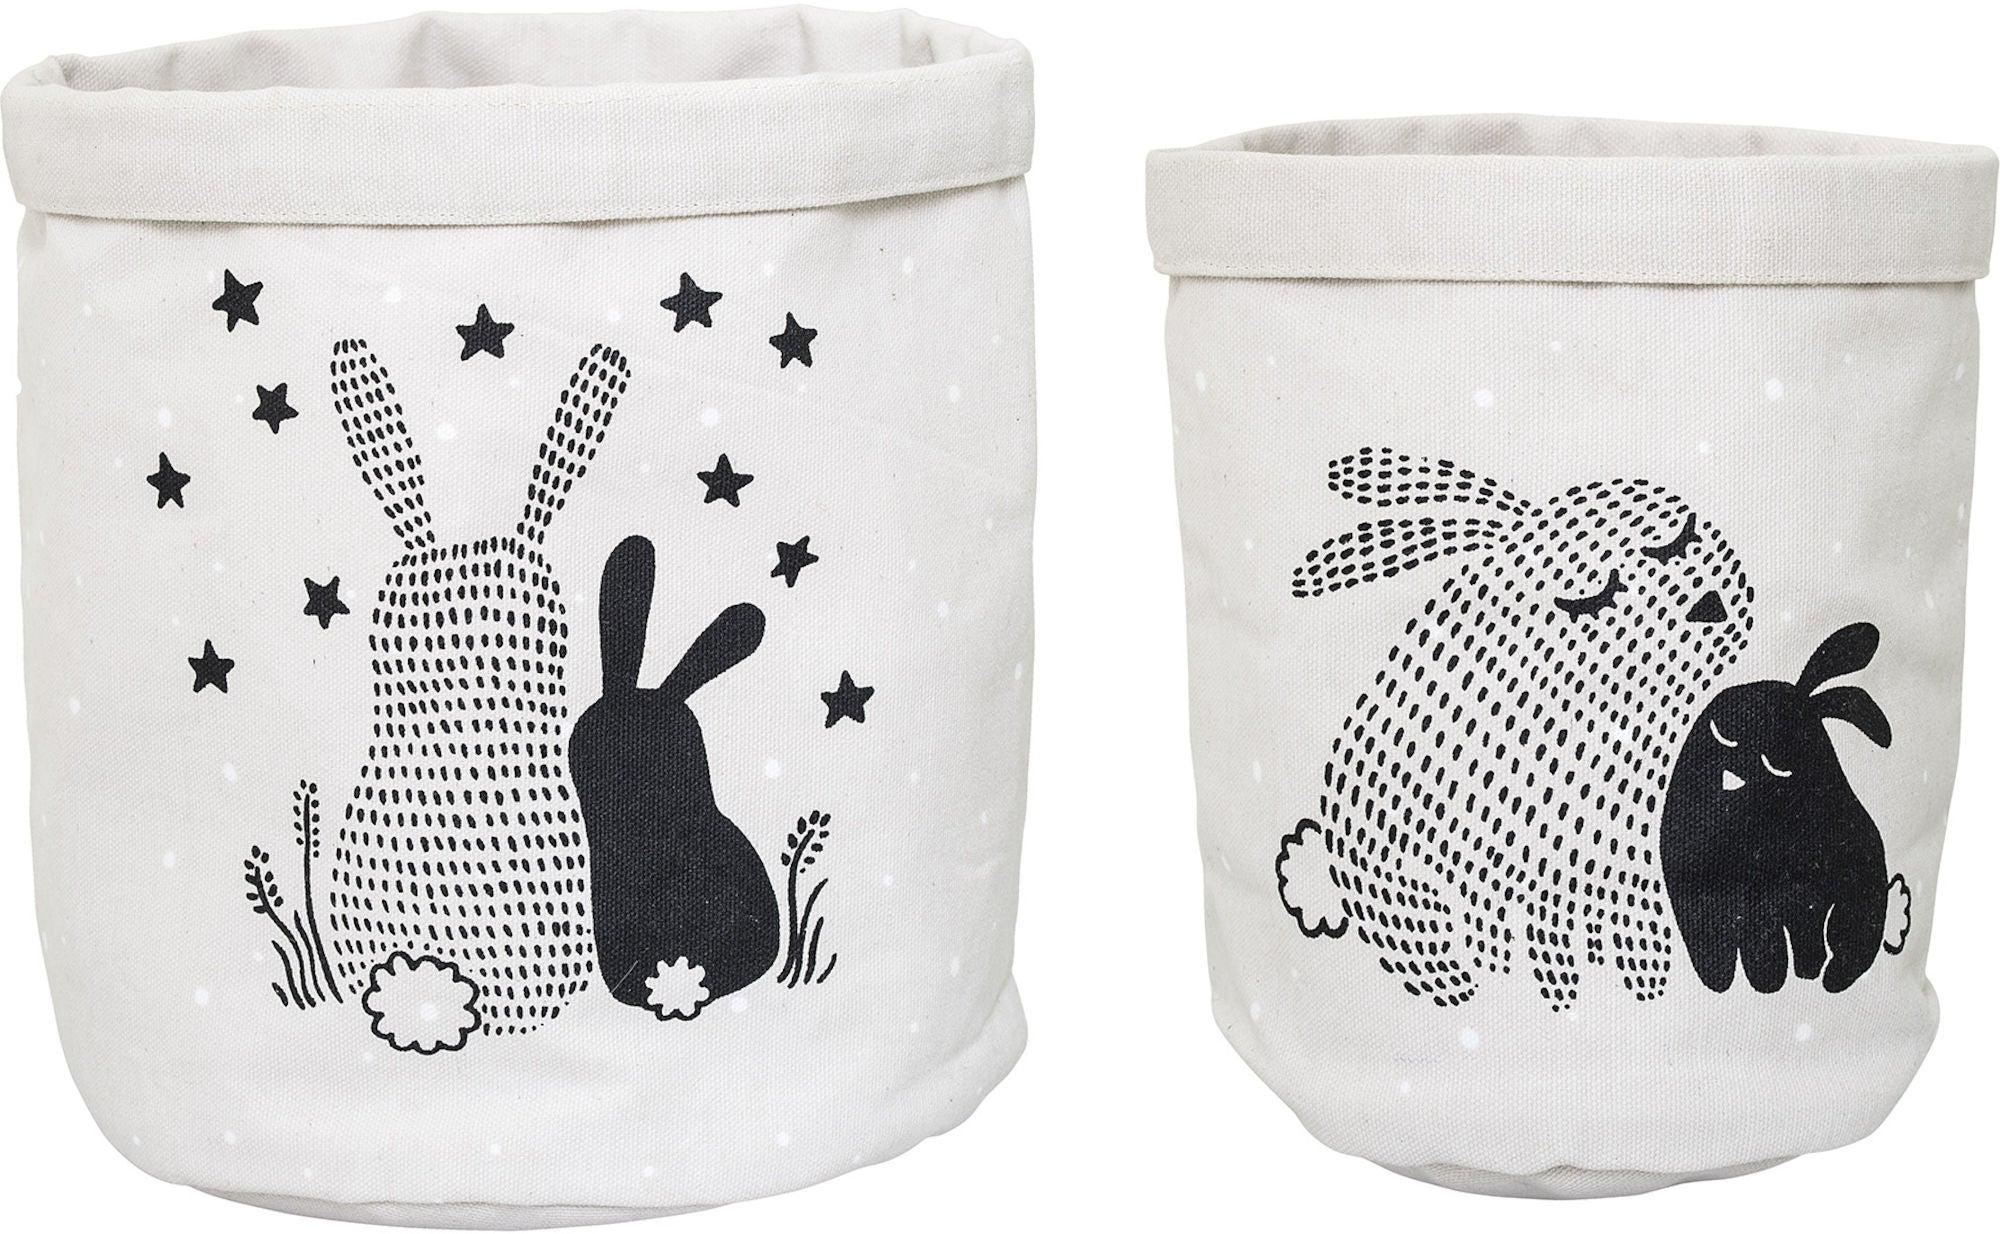 kaufen bloomingville aufbewahrungssack 2er pack kaninchen jollyroom. Black Bedroom Furniture Sets. Home Design Ideas